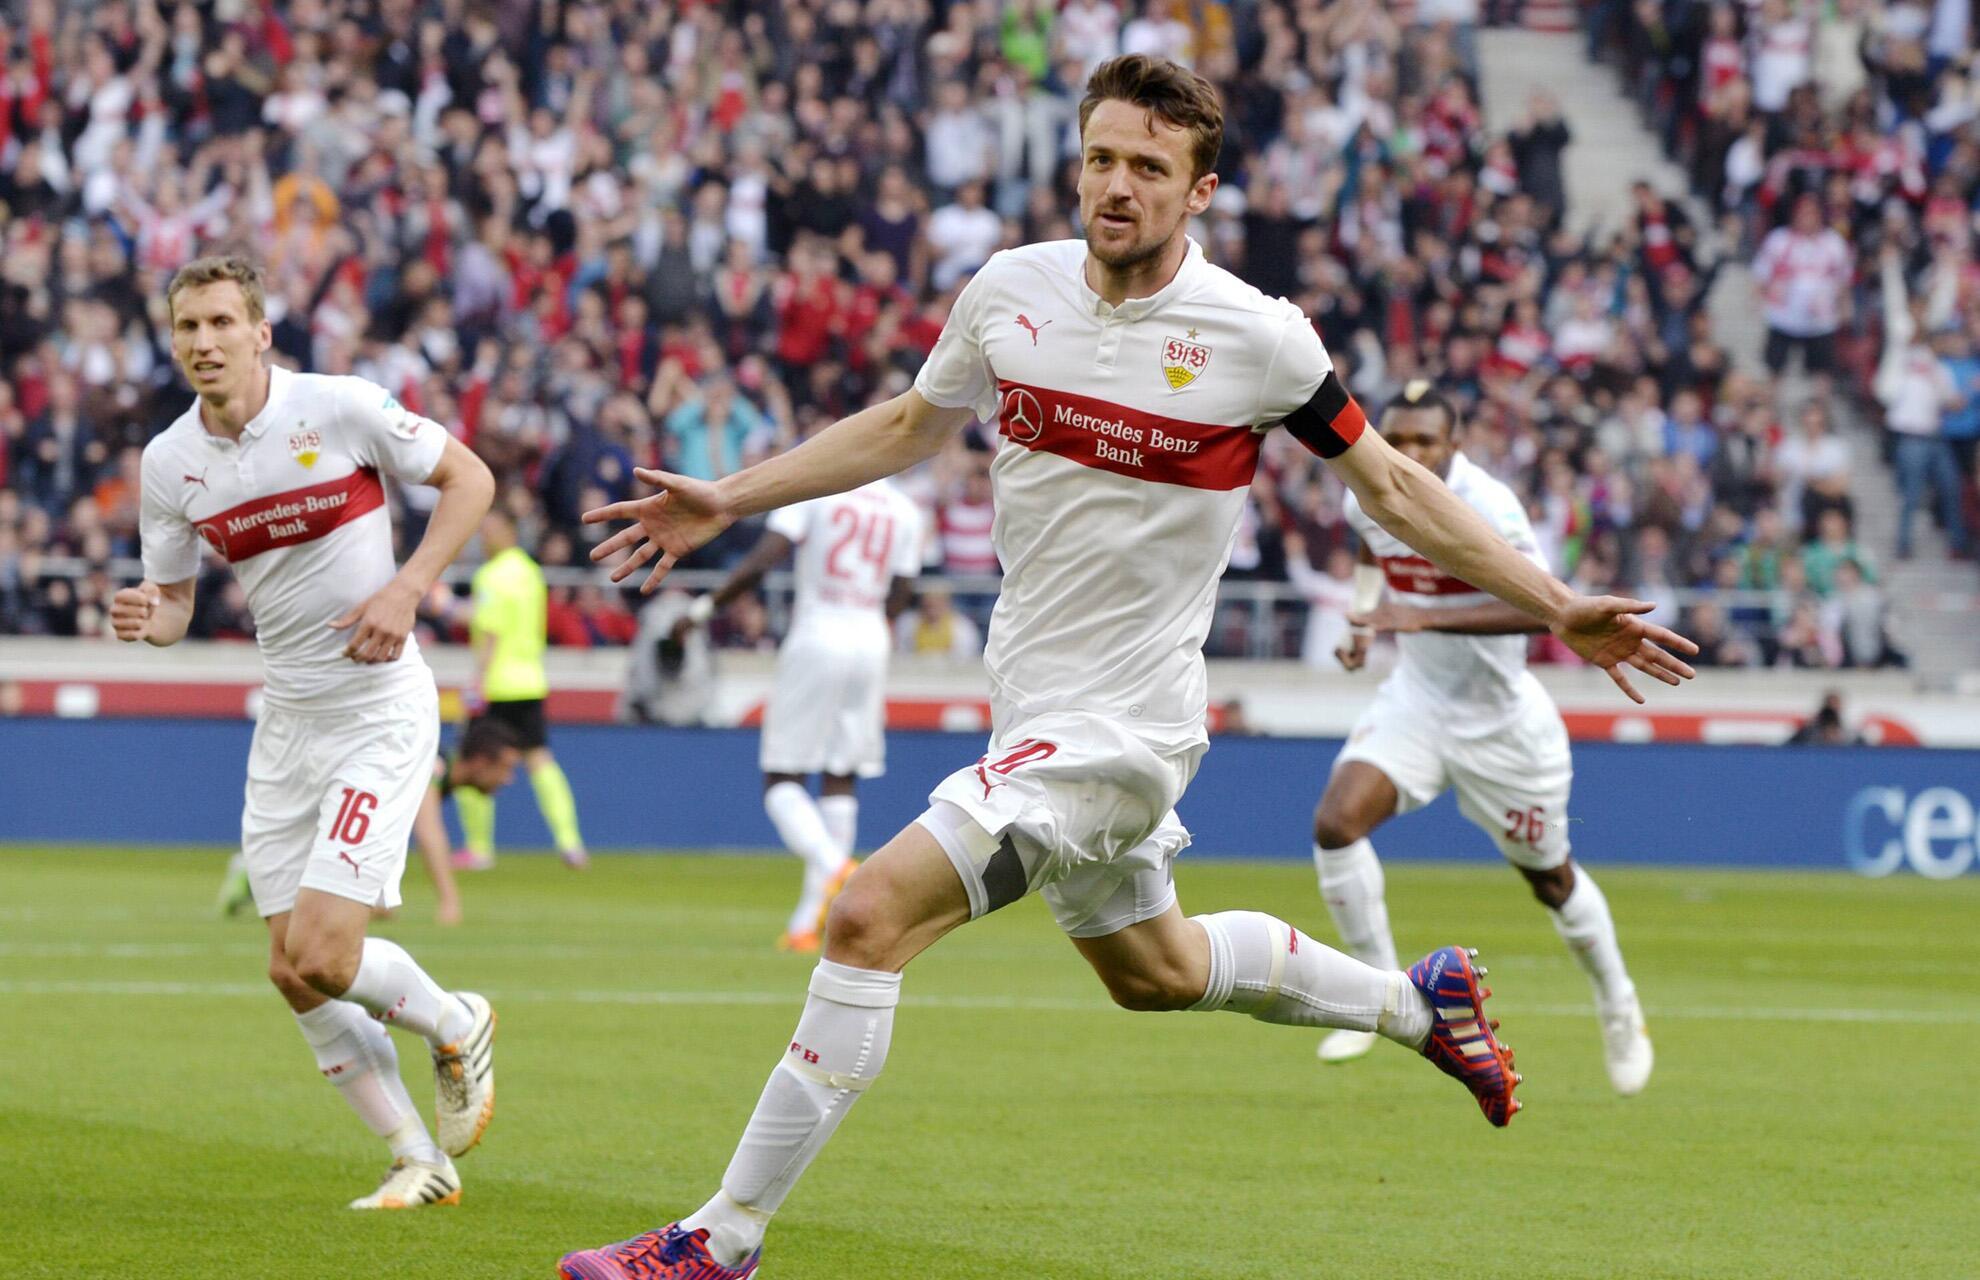 spielstand bayern champions league